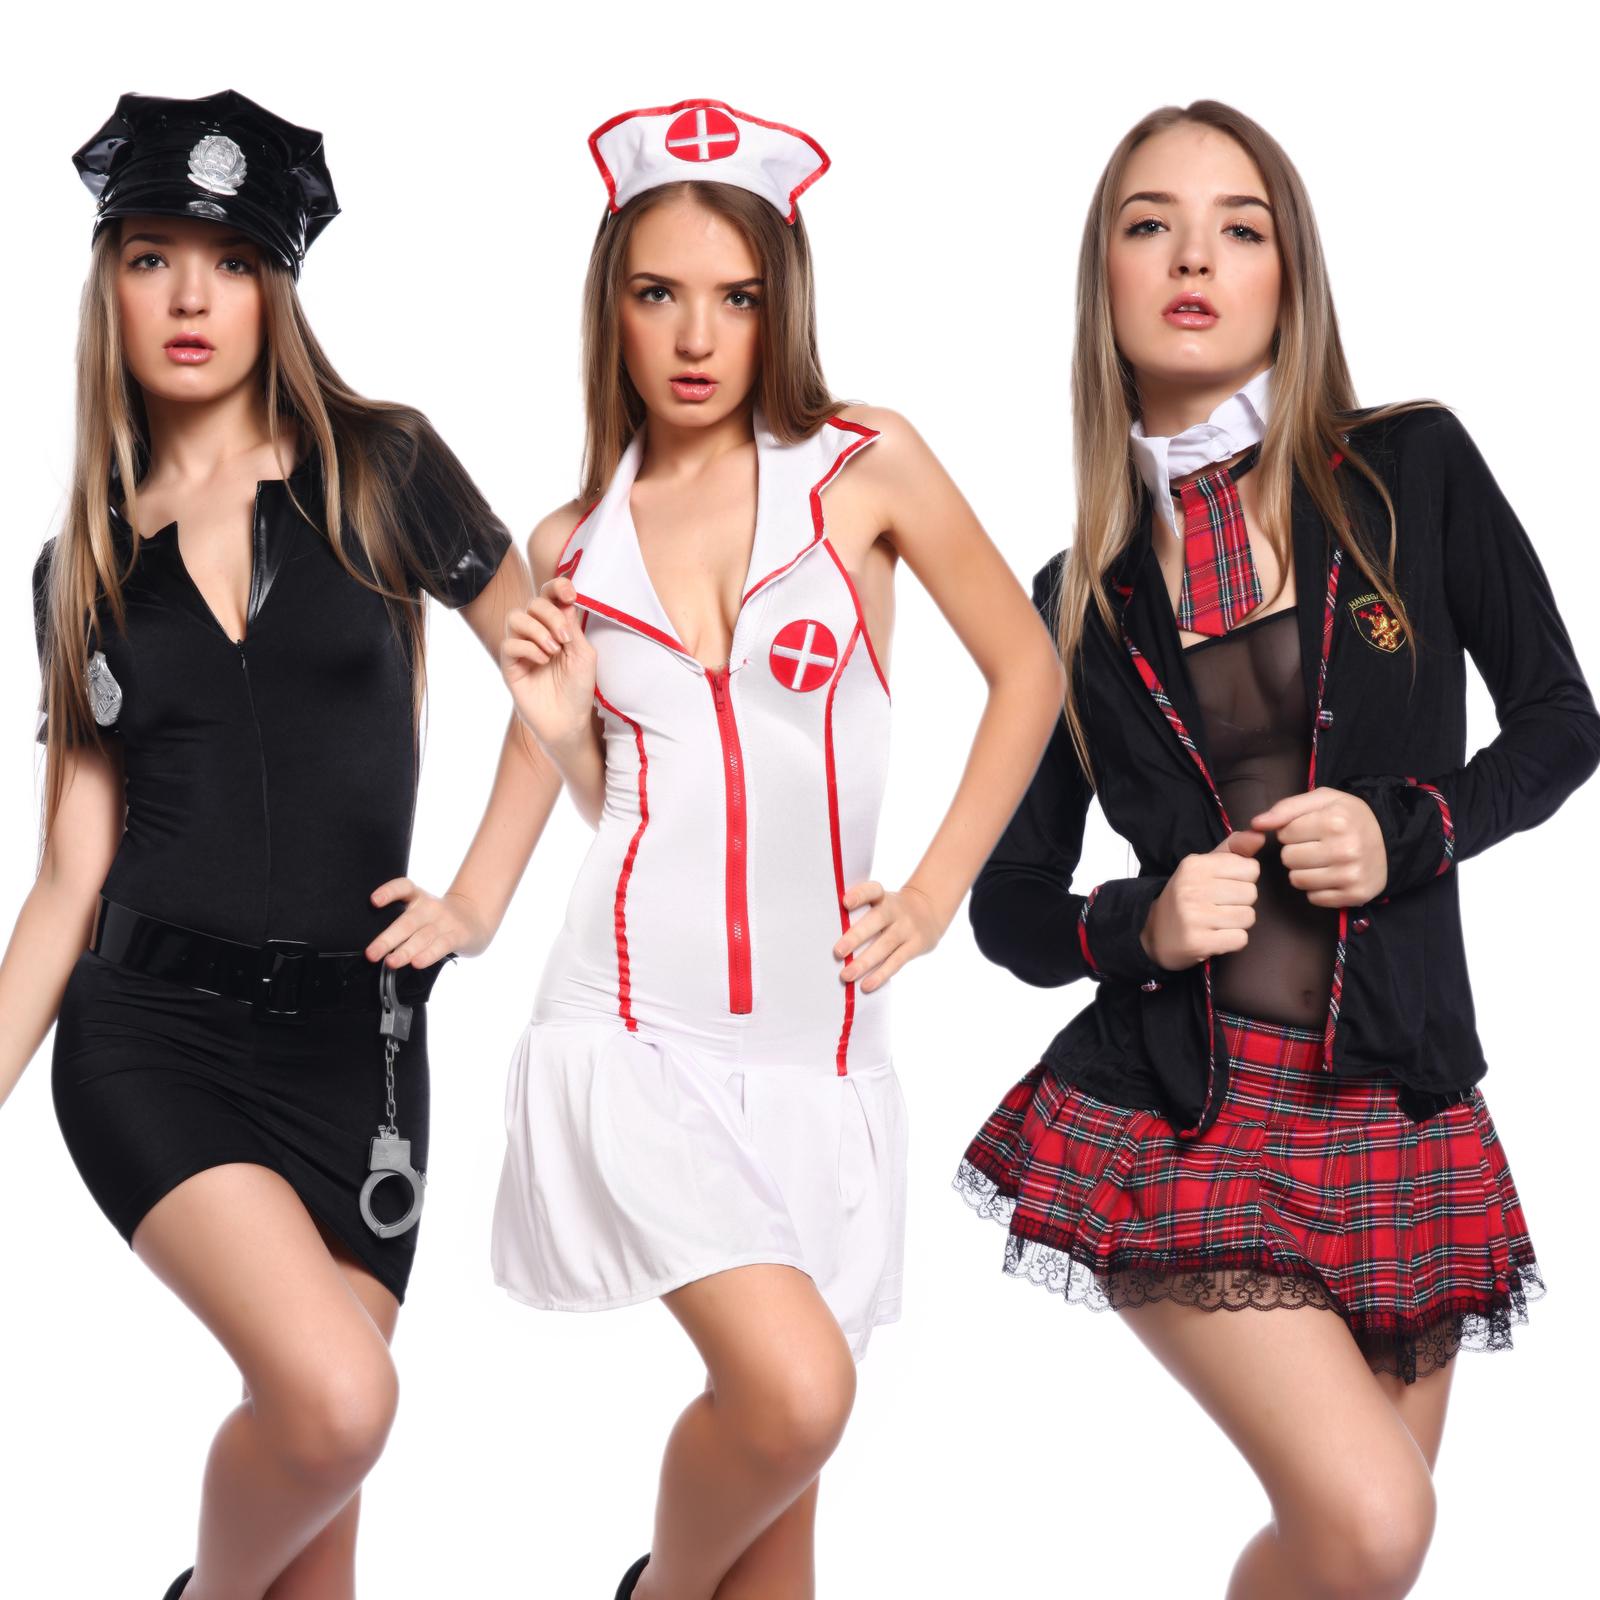 Women schoolgirl outfit sexy uniform ladies police nurse costume women schoolgirl outfit sexy policewoman cop uniform nurse costume fancy dress solutioingenieria Images